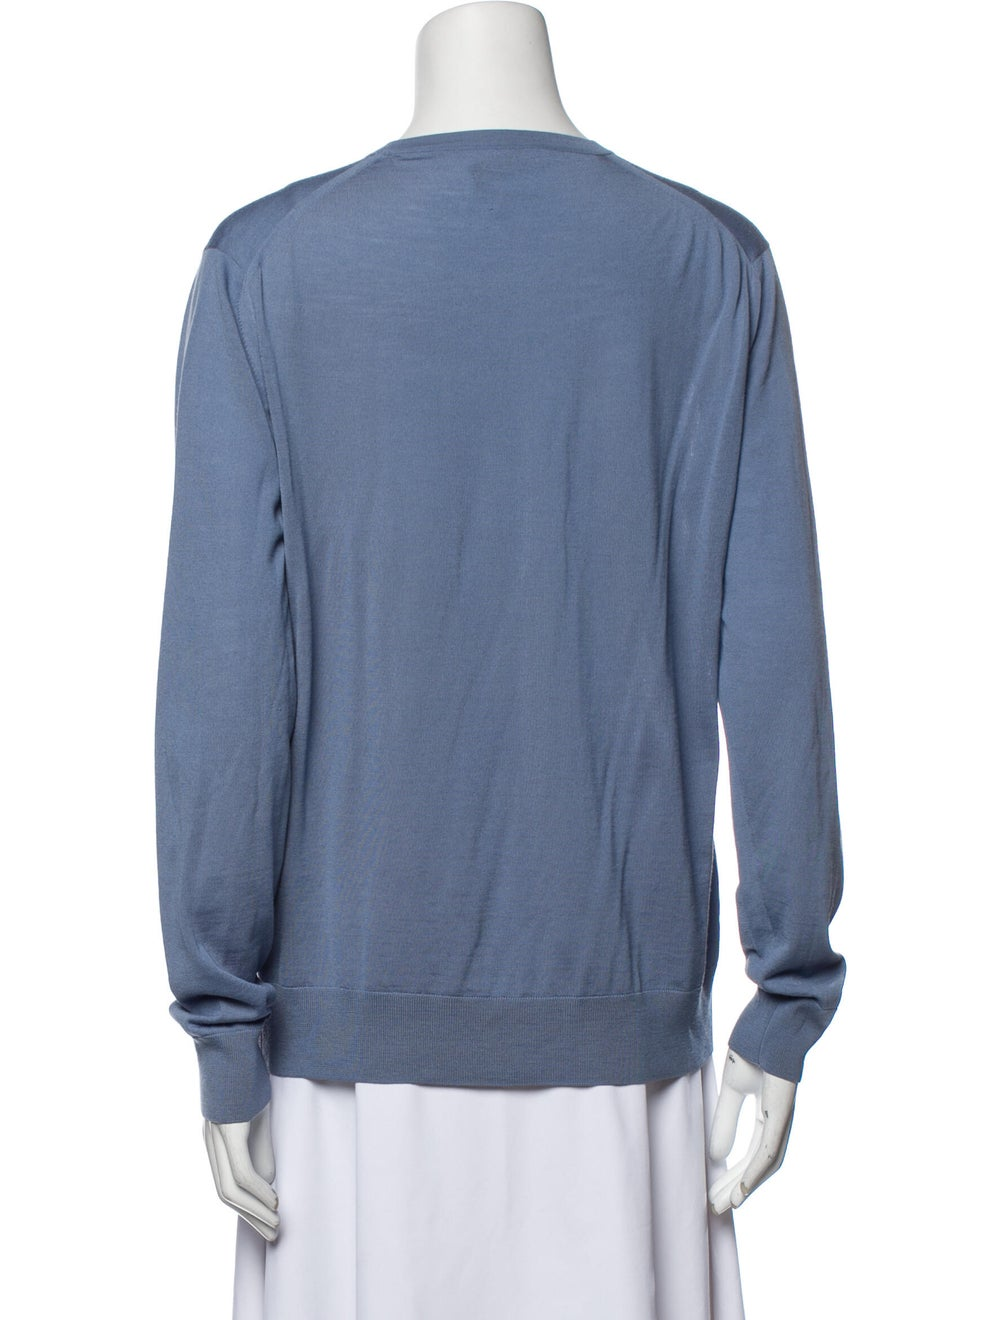 Prada Virgin Wool Crew Neck Sweater Wool - image 3